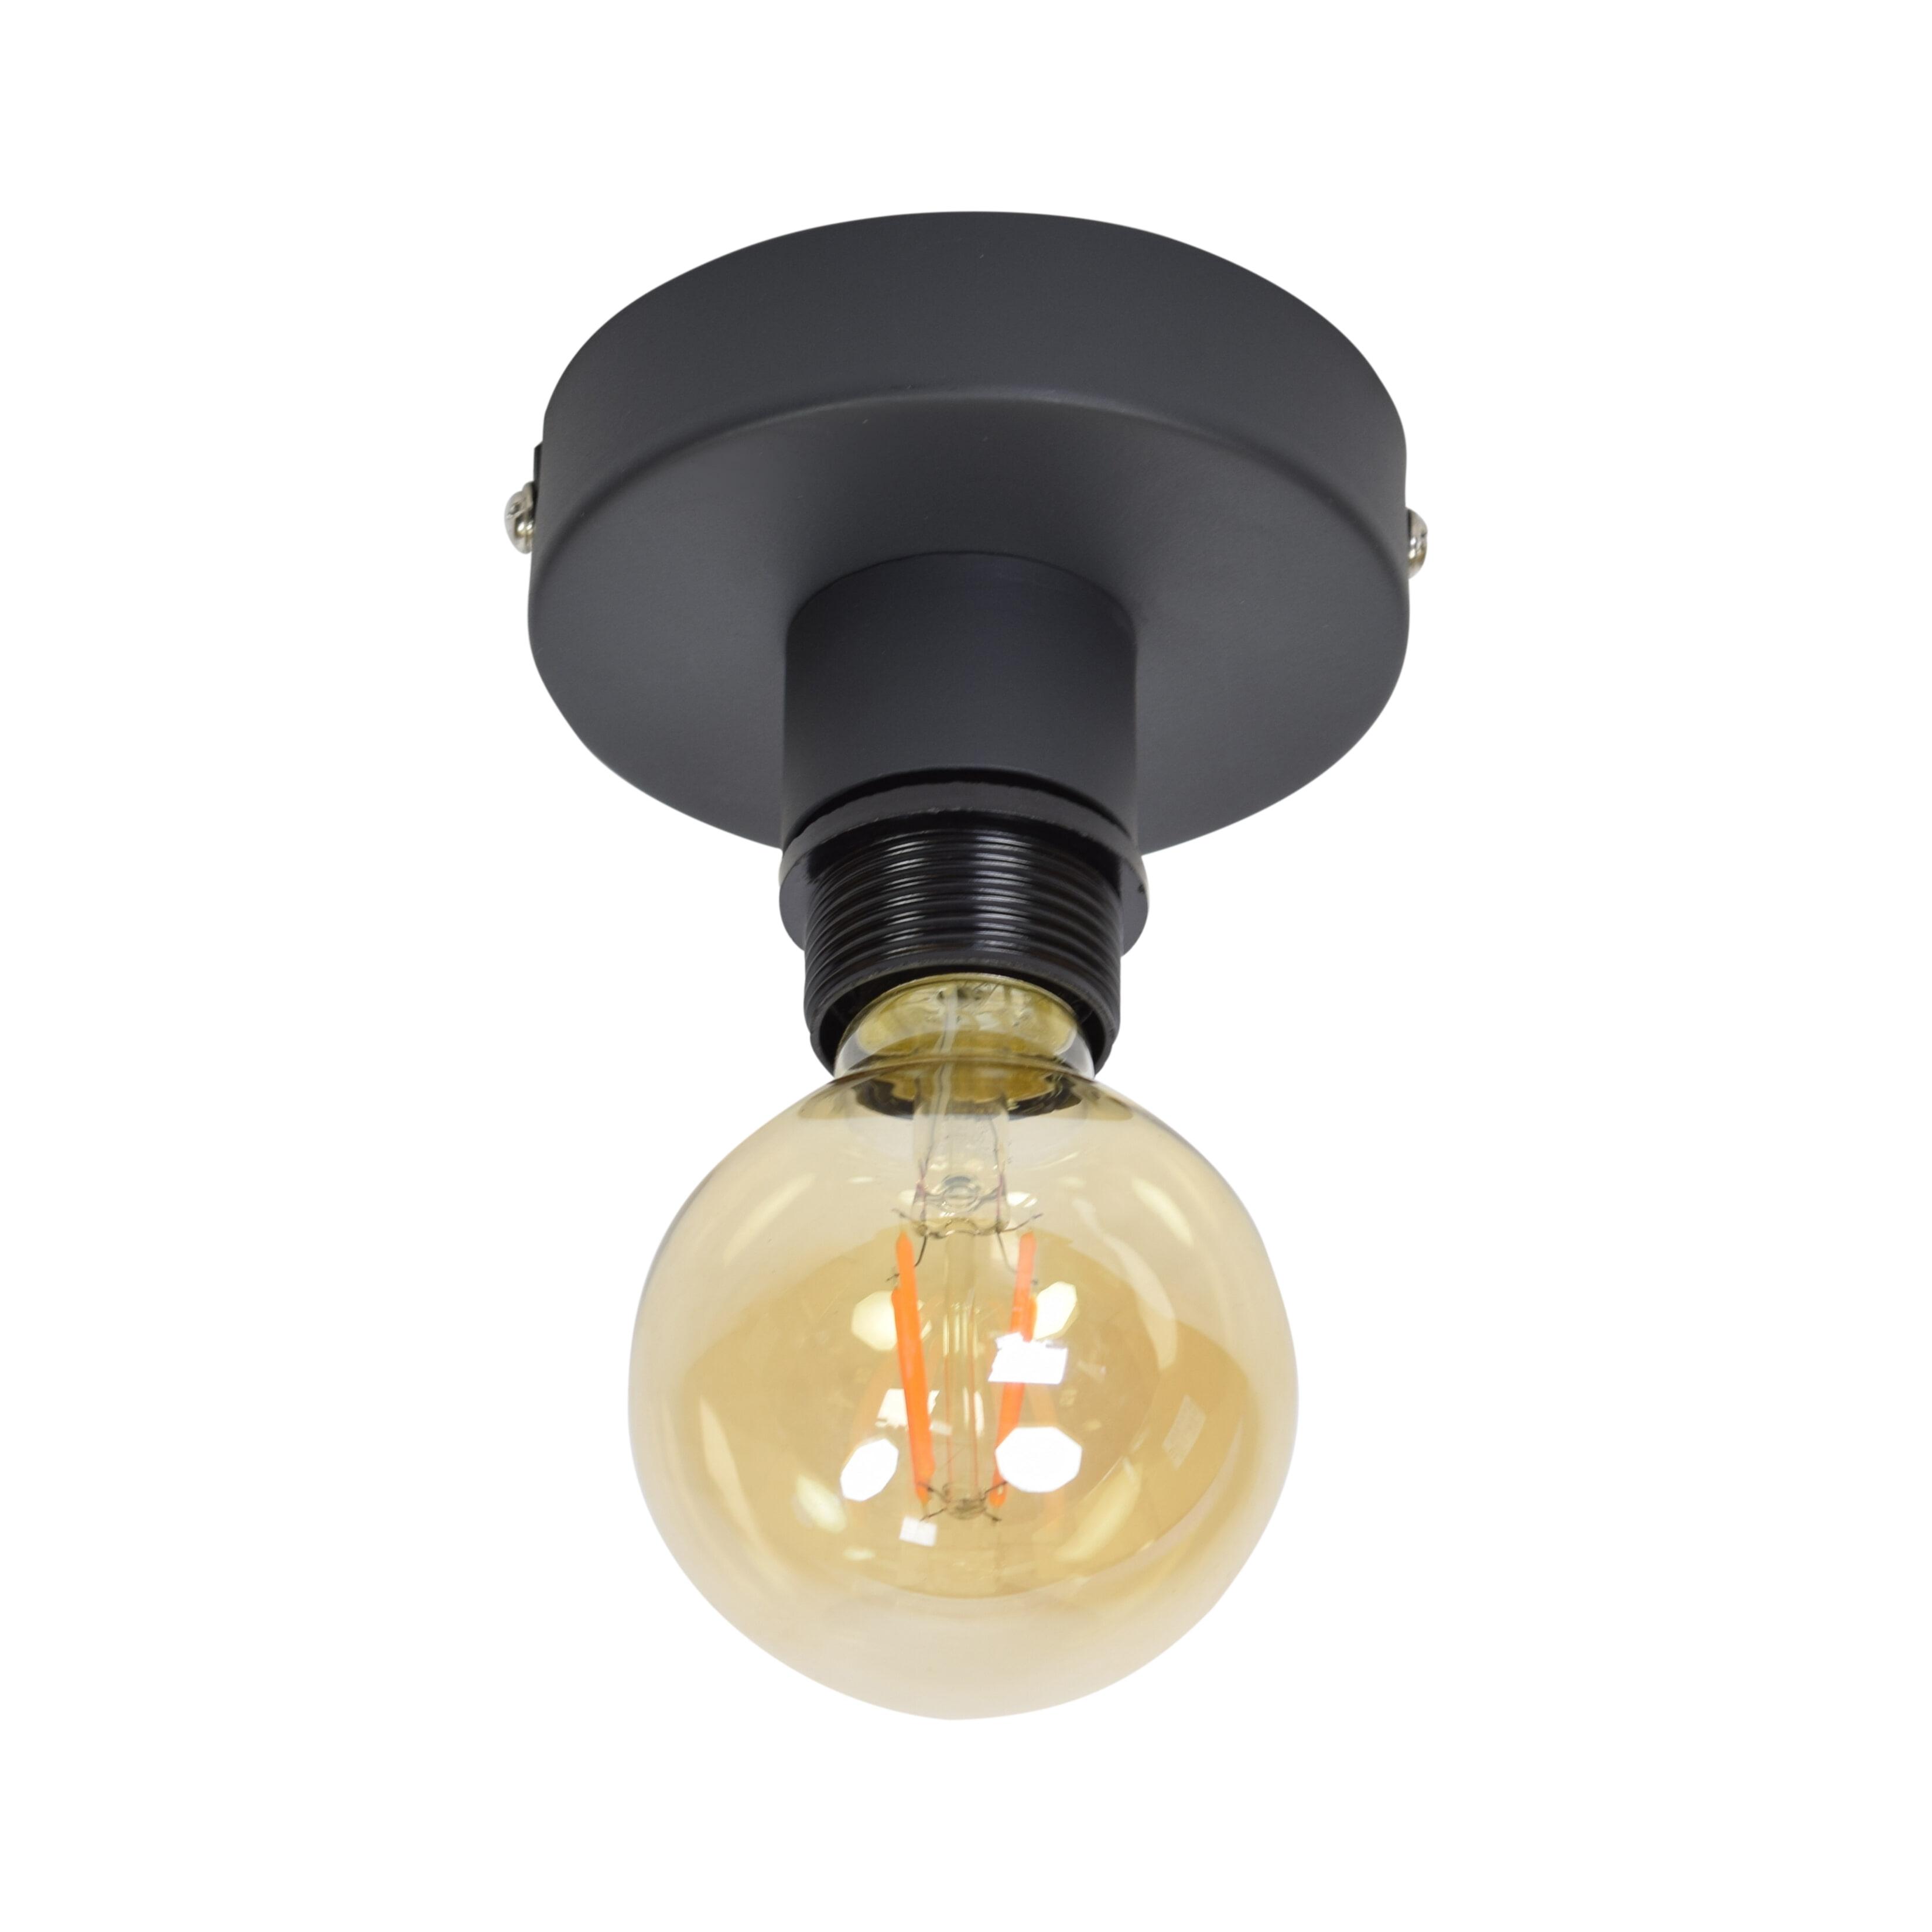 Urban Interiors plafondlamp 'Single', kleur Vintage Black